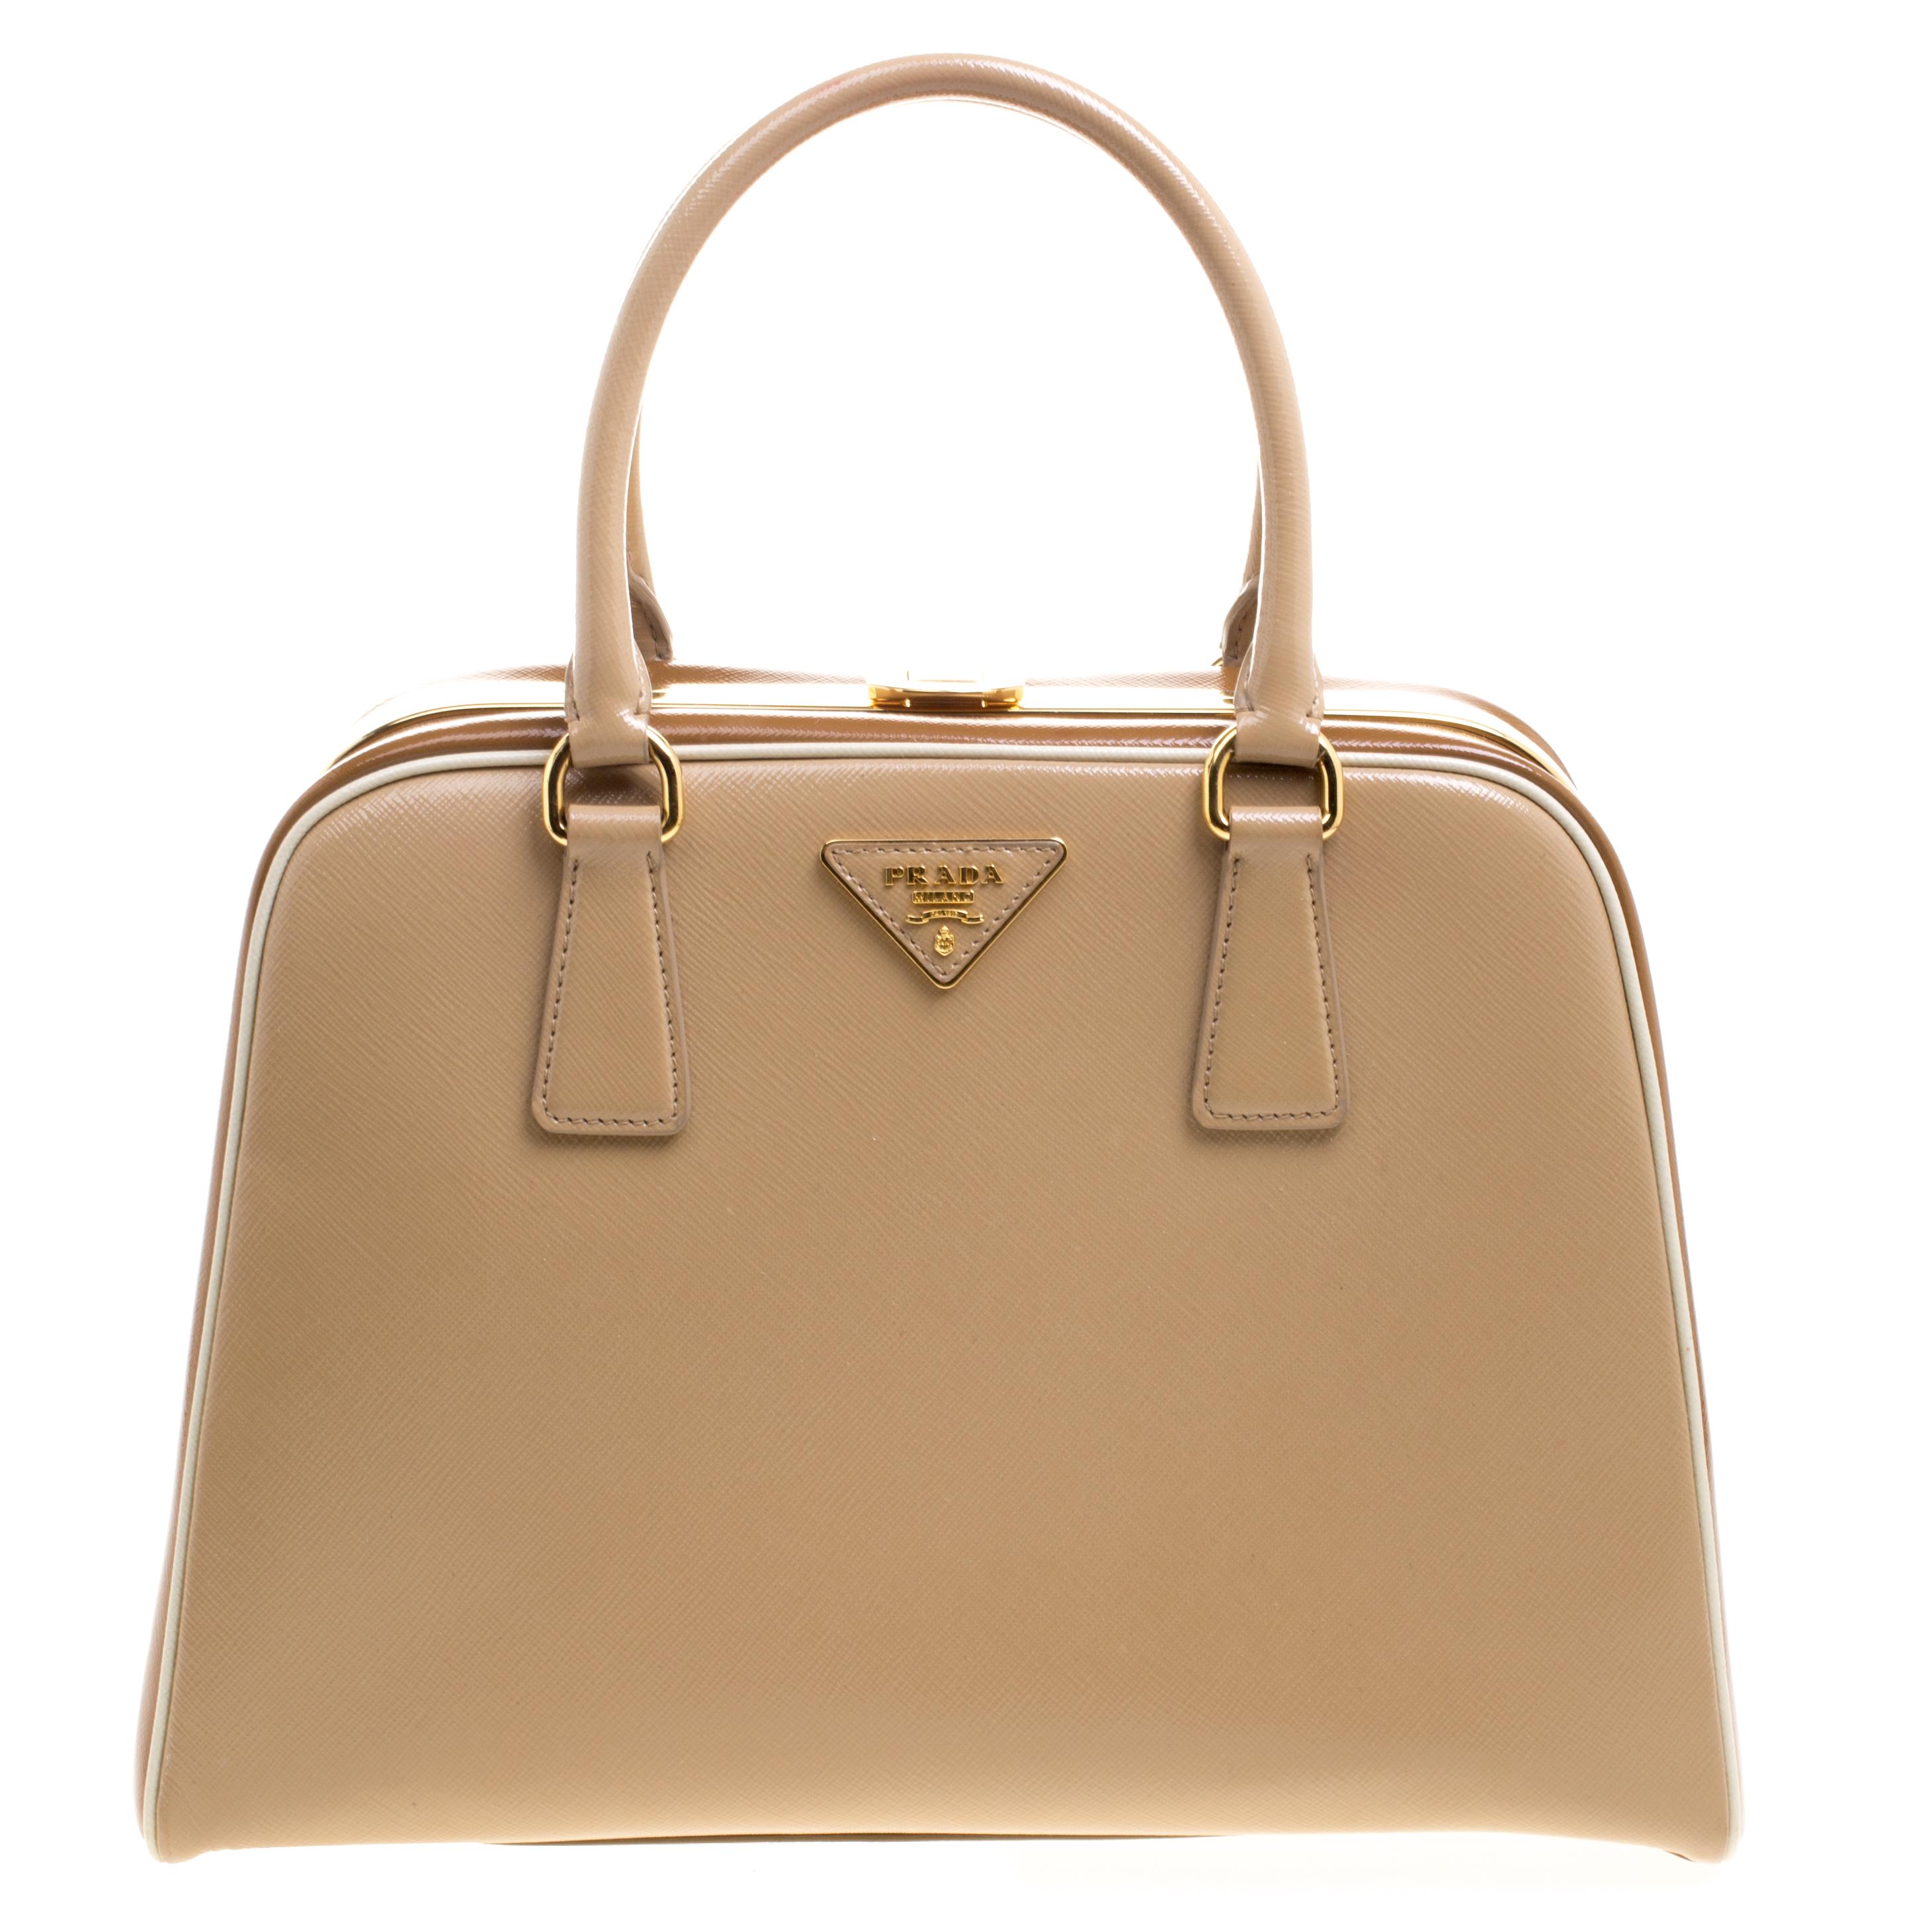 Buy Prada Beige Caramel Patent Leather Pyramid Frame Top Handle Bag ... 0cdc6b9cbb9d1